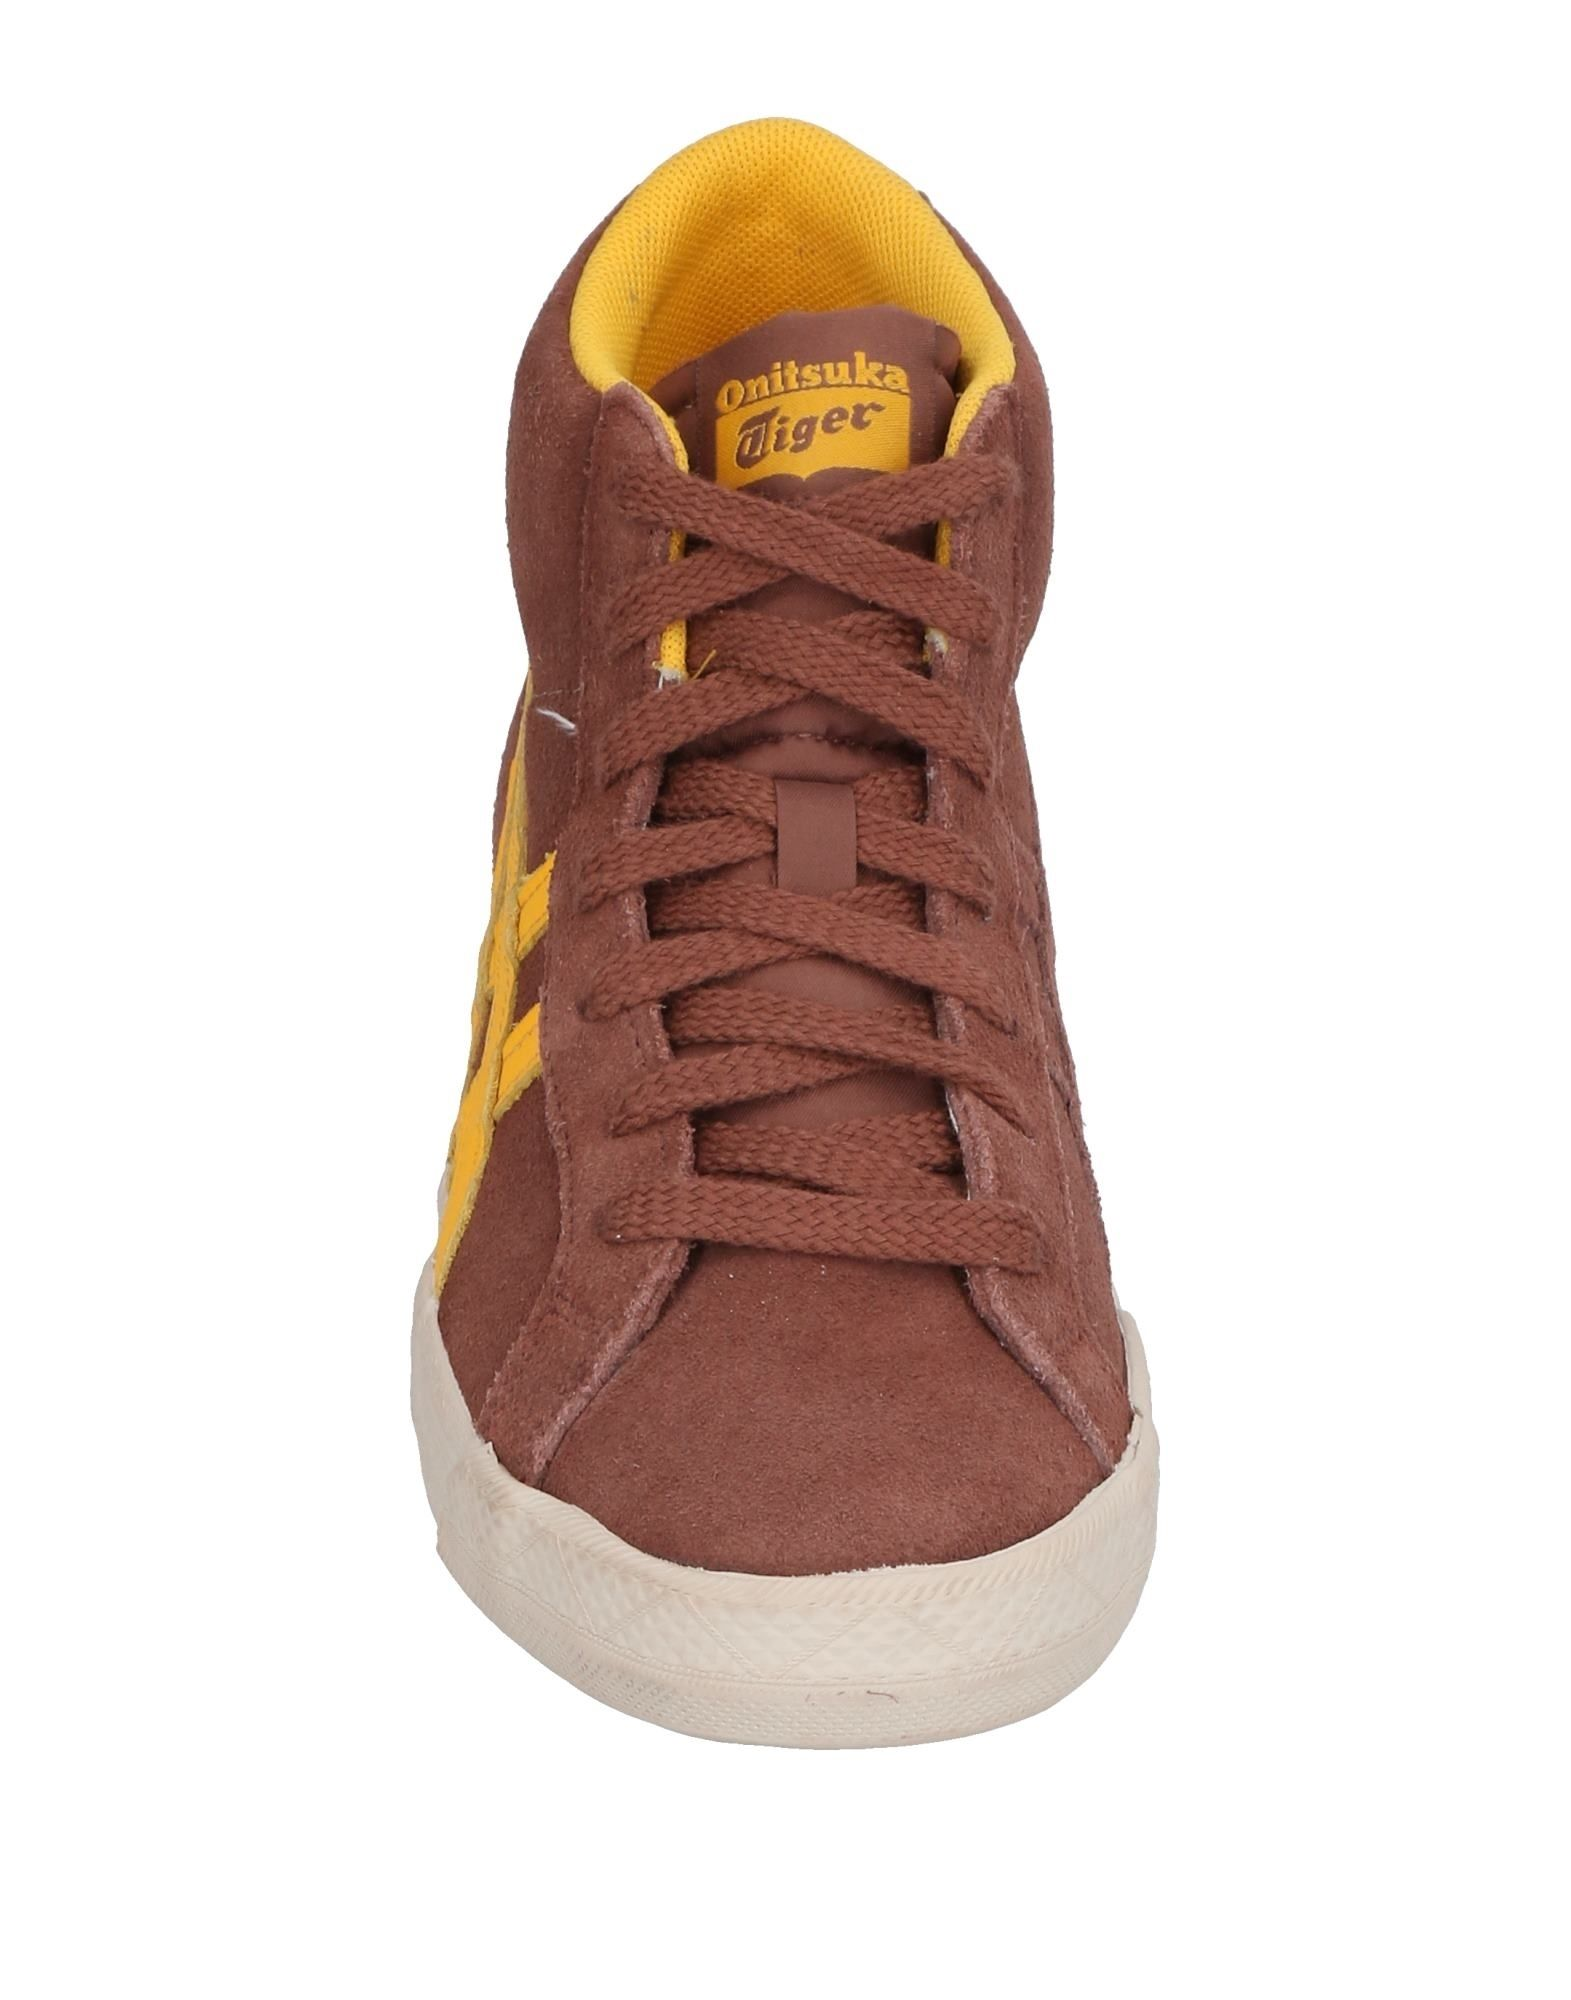 Onitsuka Tiger Sneakers Damen beliebte  11457275LA Gute Qualität beliebte Damen Schuhe fb0b13